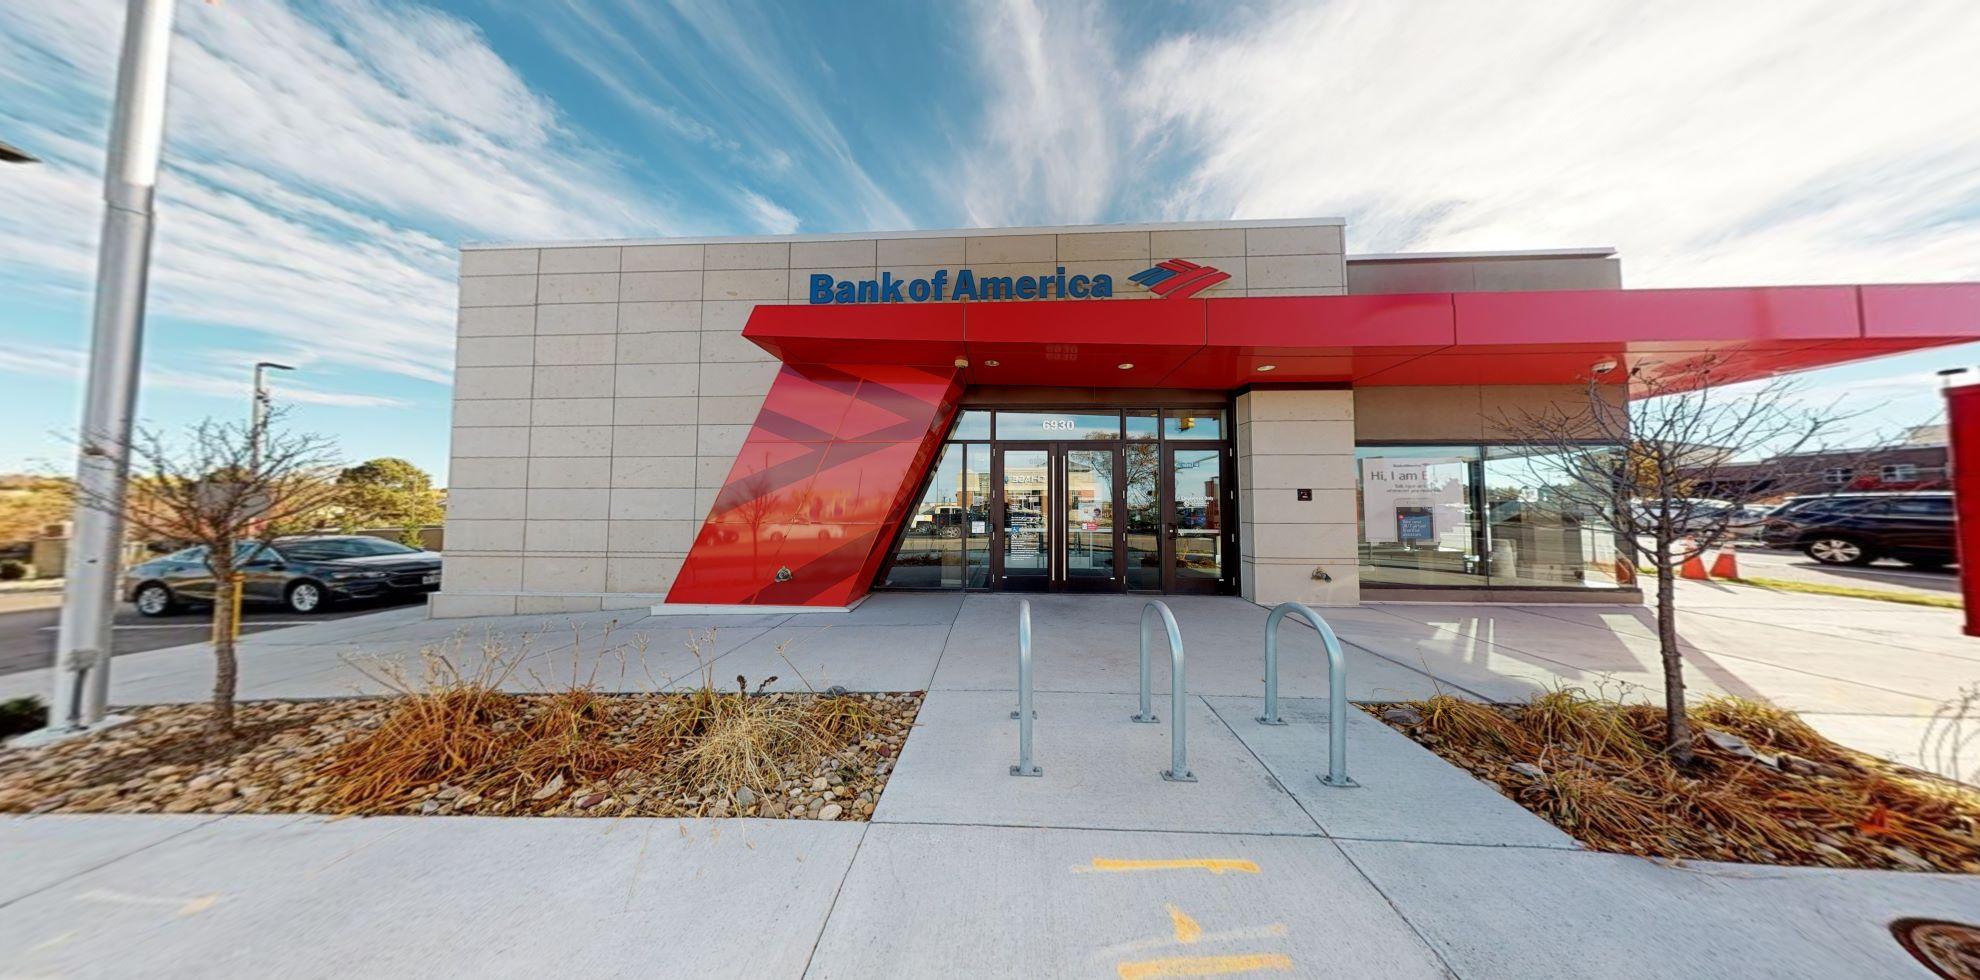 Bank of America financial center with drive-thru ATM | 6930 S University Blvd, Centennial, CO 80122